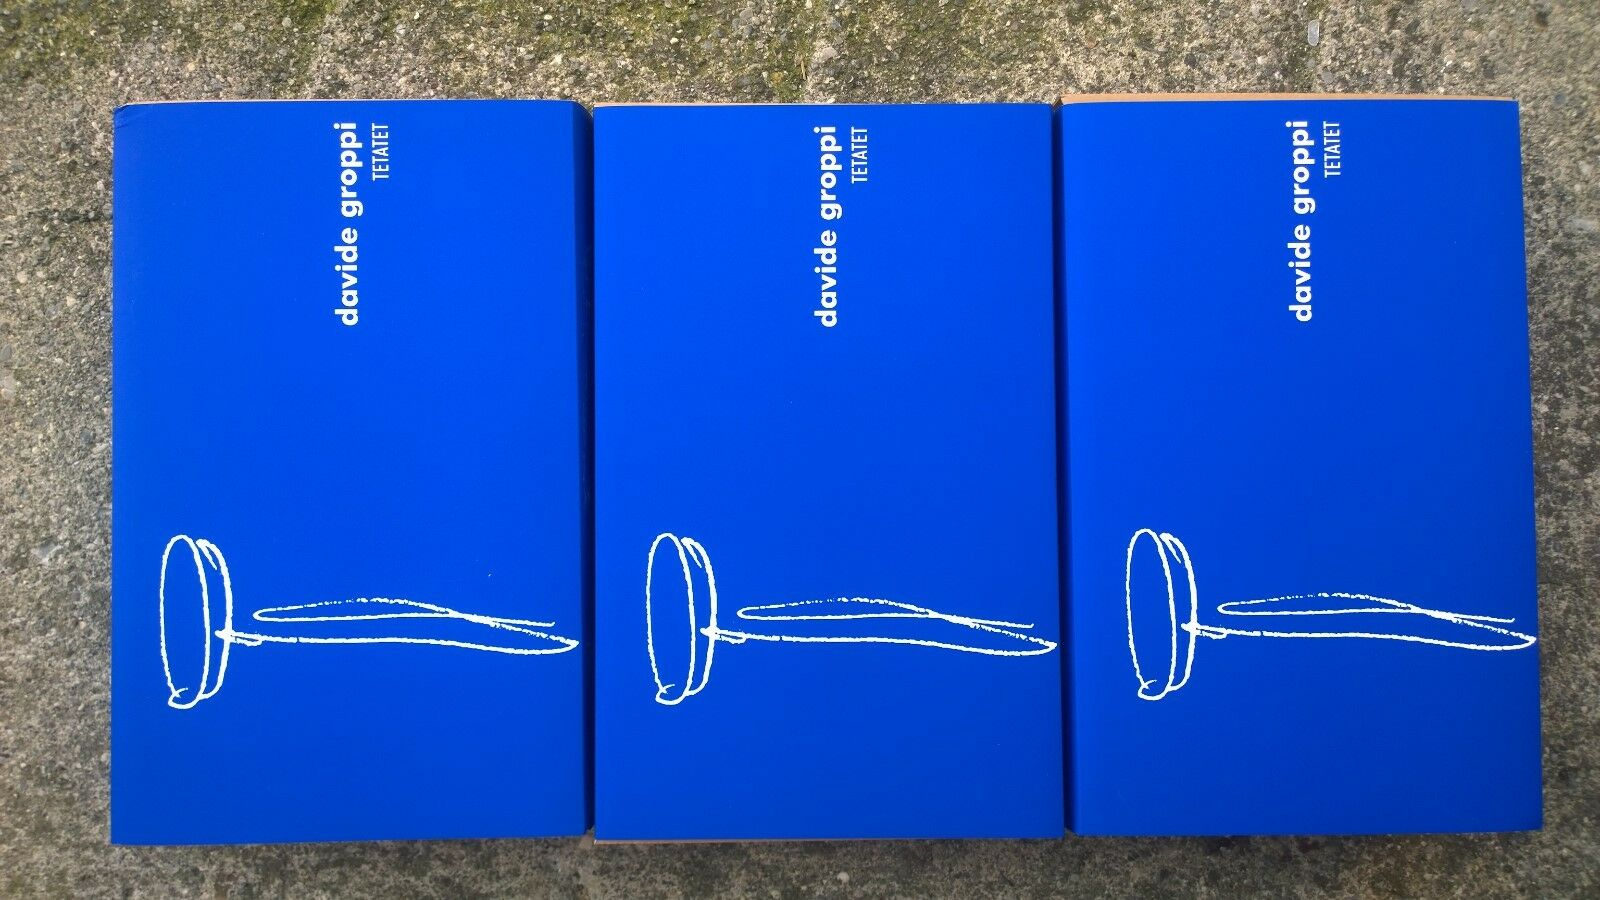 Ue- davide groppi - Tetatet - 3 Pieces - Weiß Matt - 170503 - 2019 Web